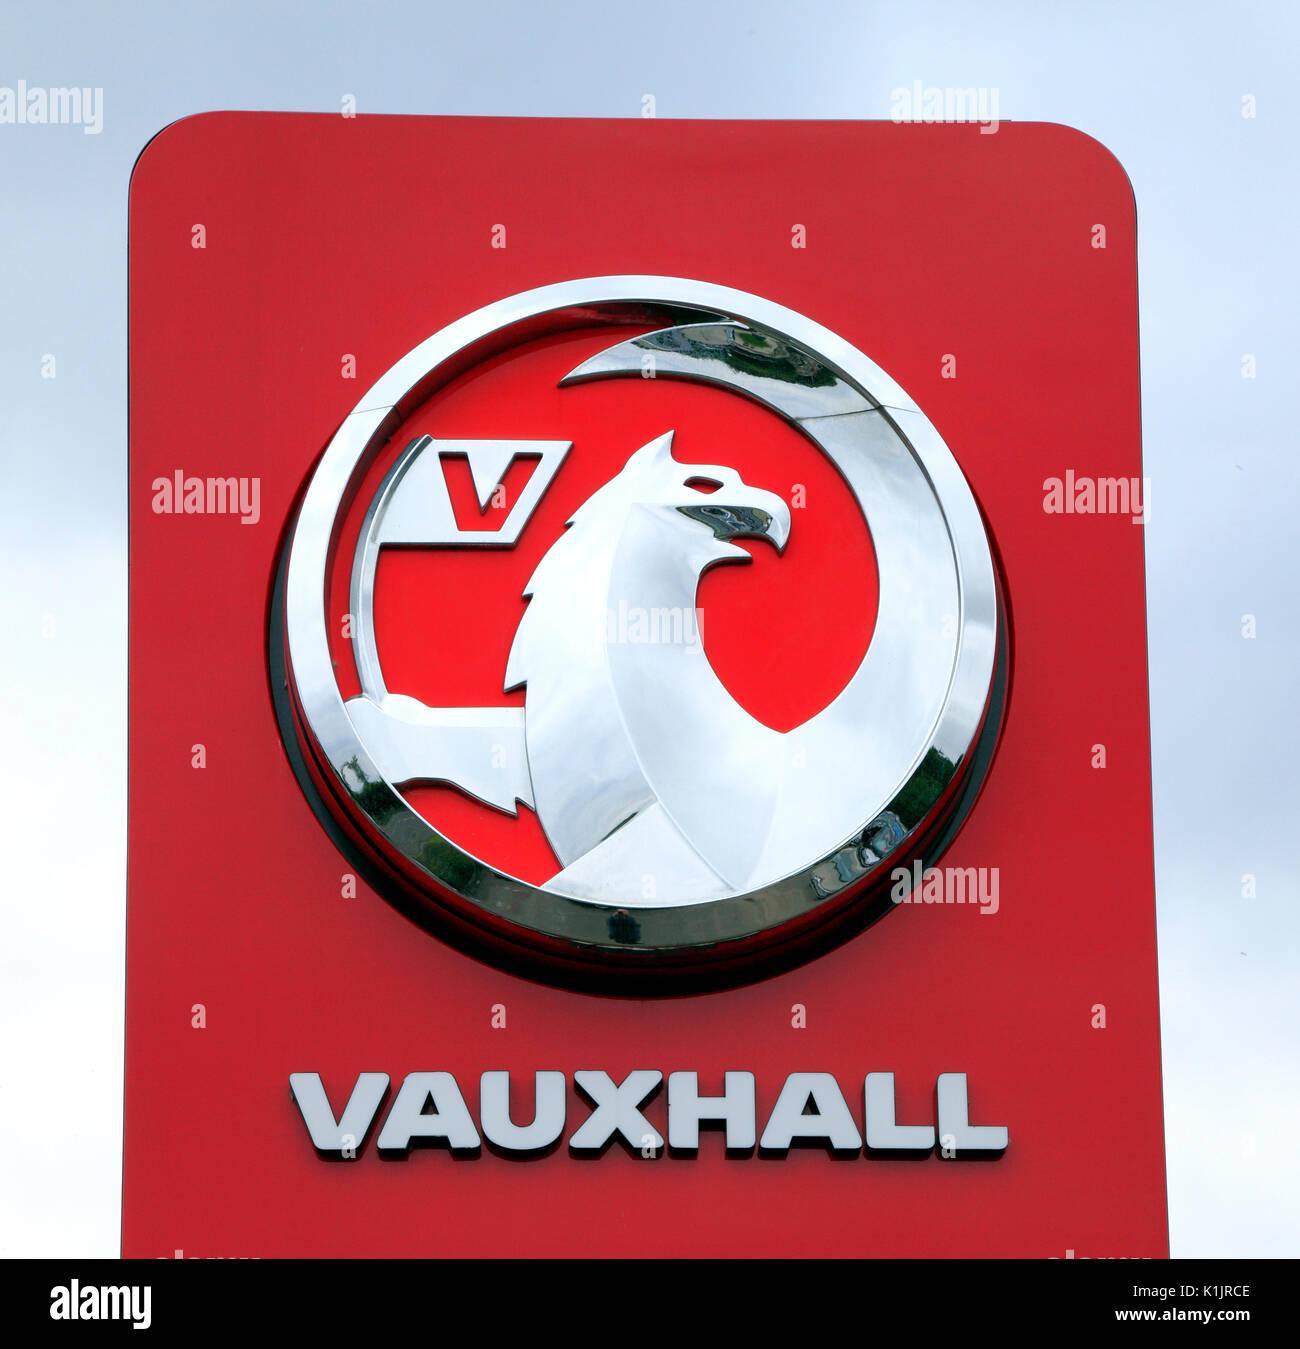 Vauxhall Motors, Motor car, logo, main dealers, vehicle, vehicles, dealer, dealership, sign, Fakenham, Norfolk, England, UK - Stock Image